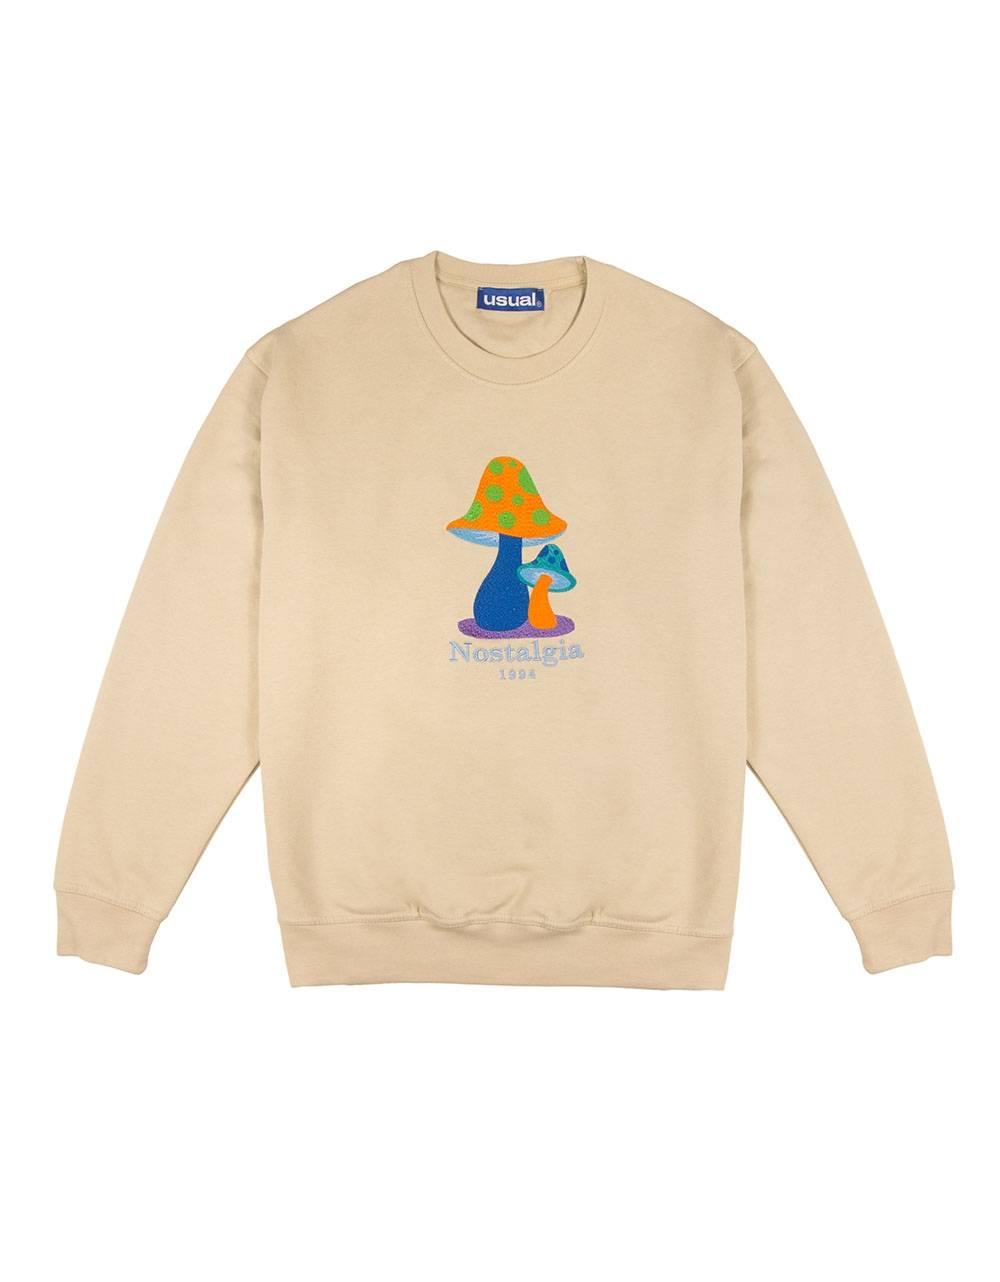 Usual Nostalgia magia crewneck sweater - Cream Usual Sweater 89,34€